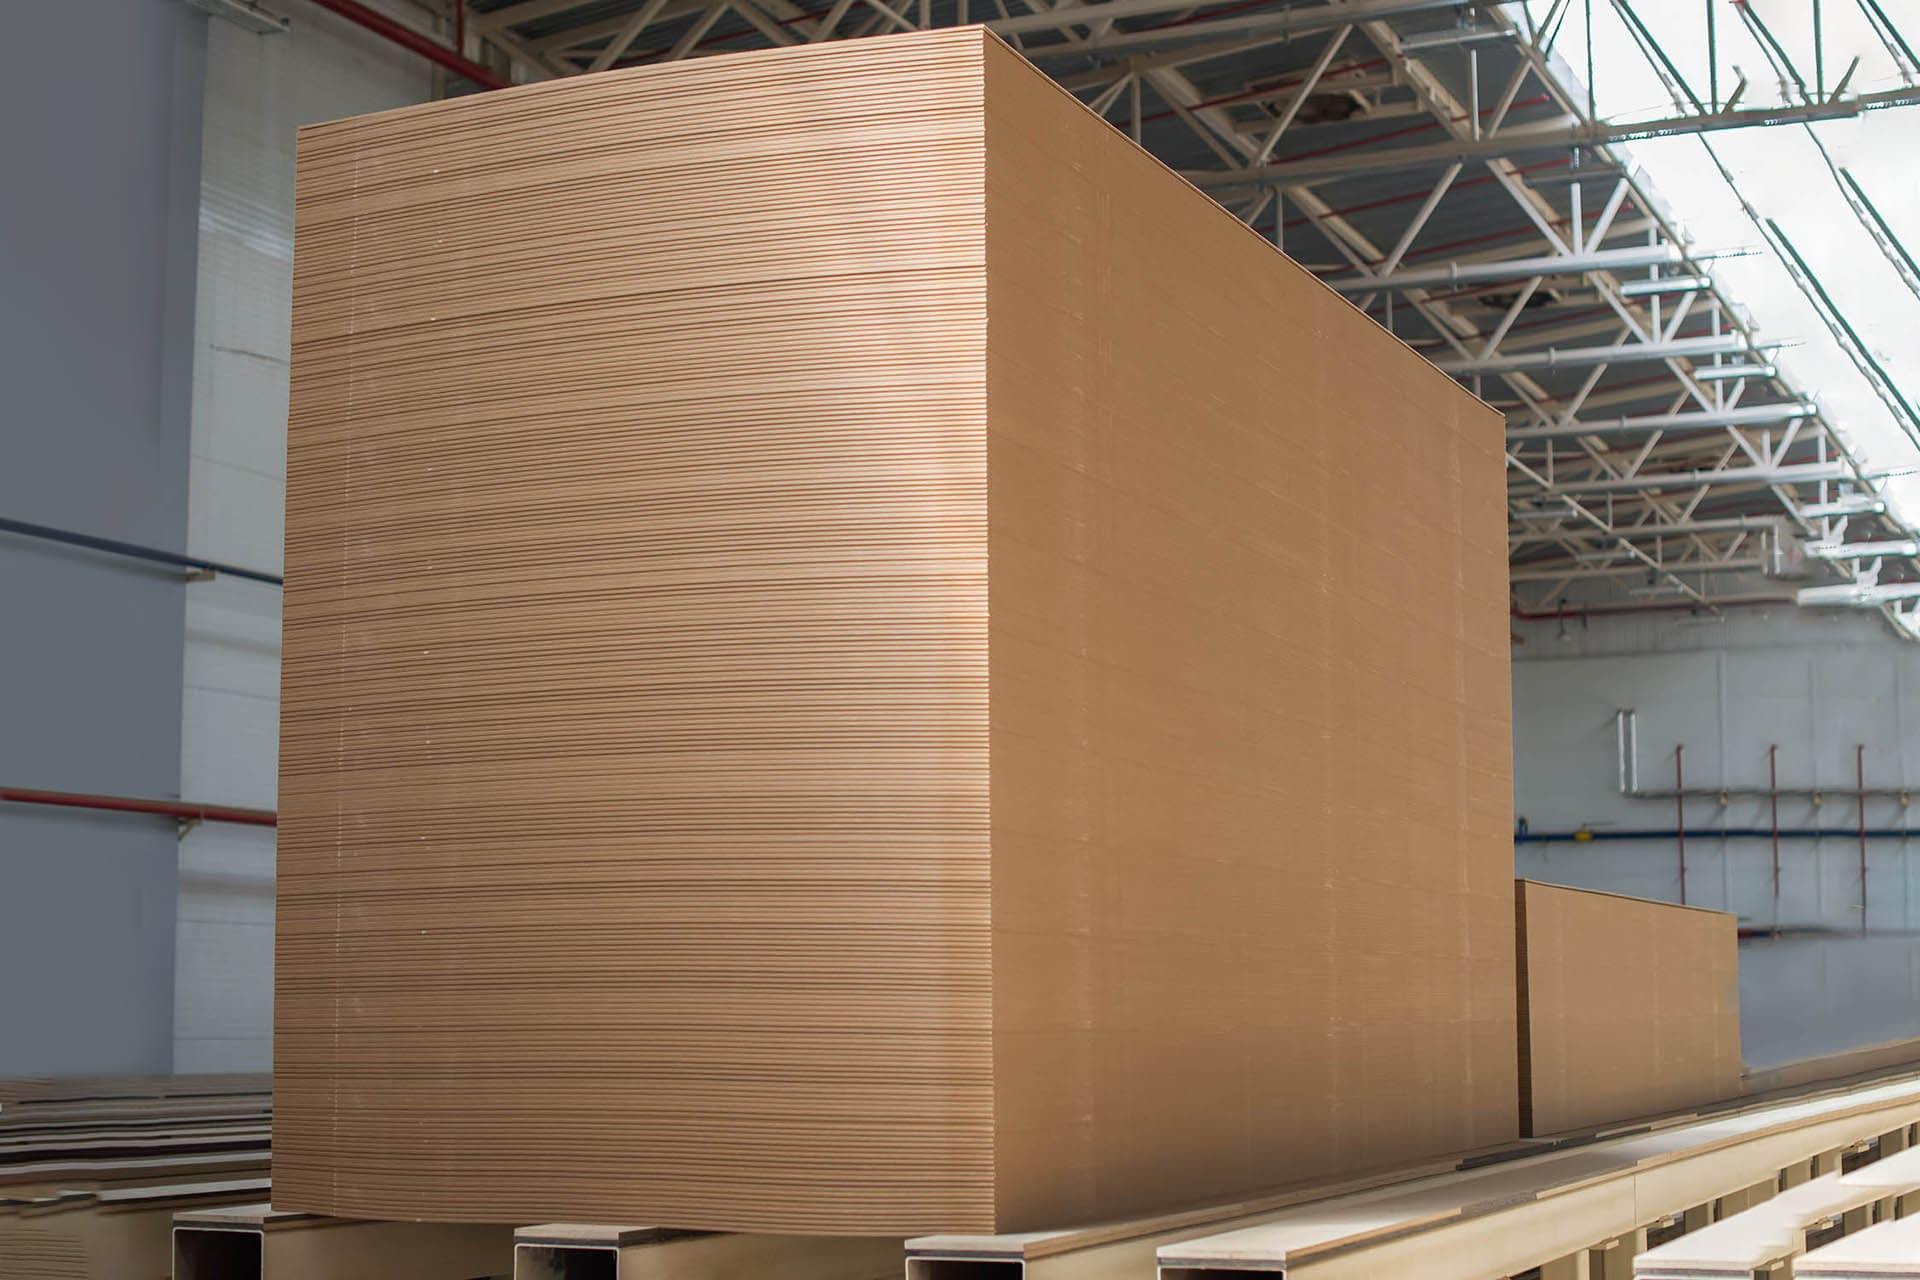 mdf board (multi-density fibreboard) internal large size sheet materials